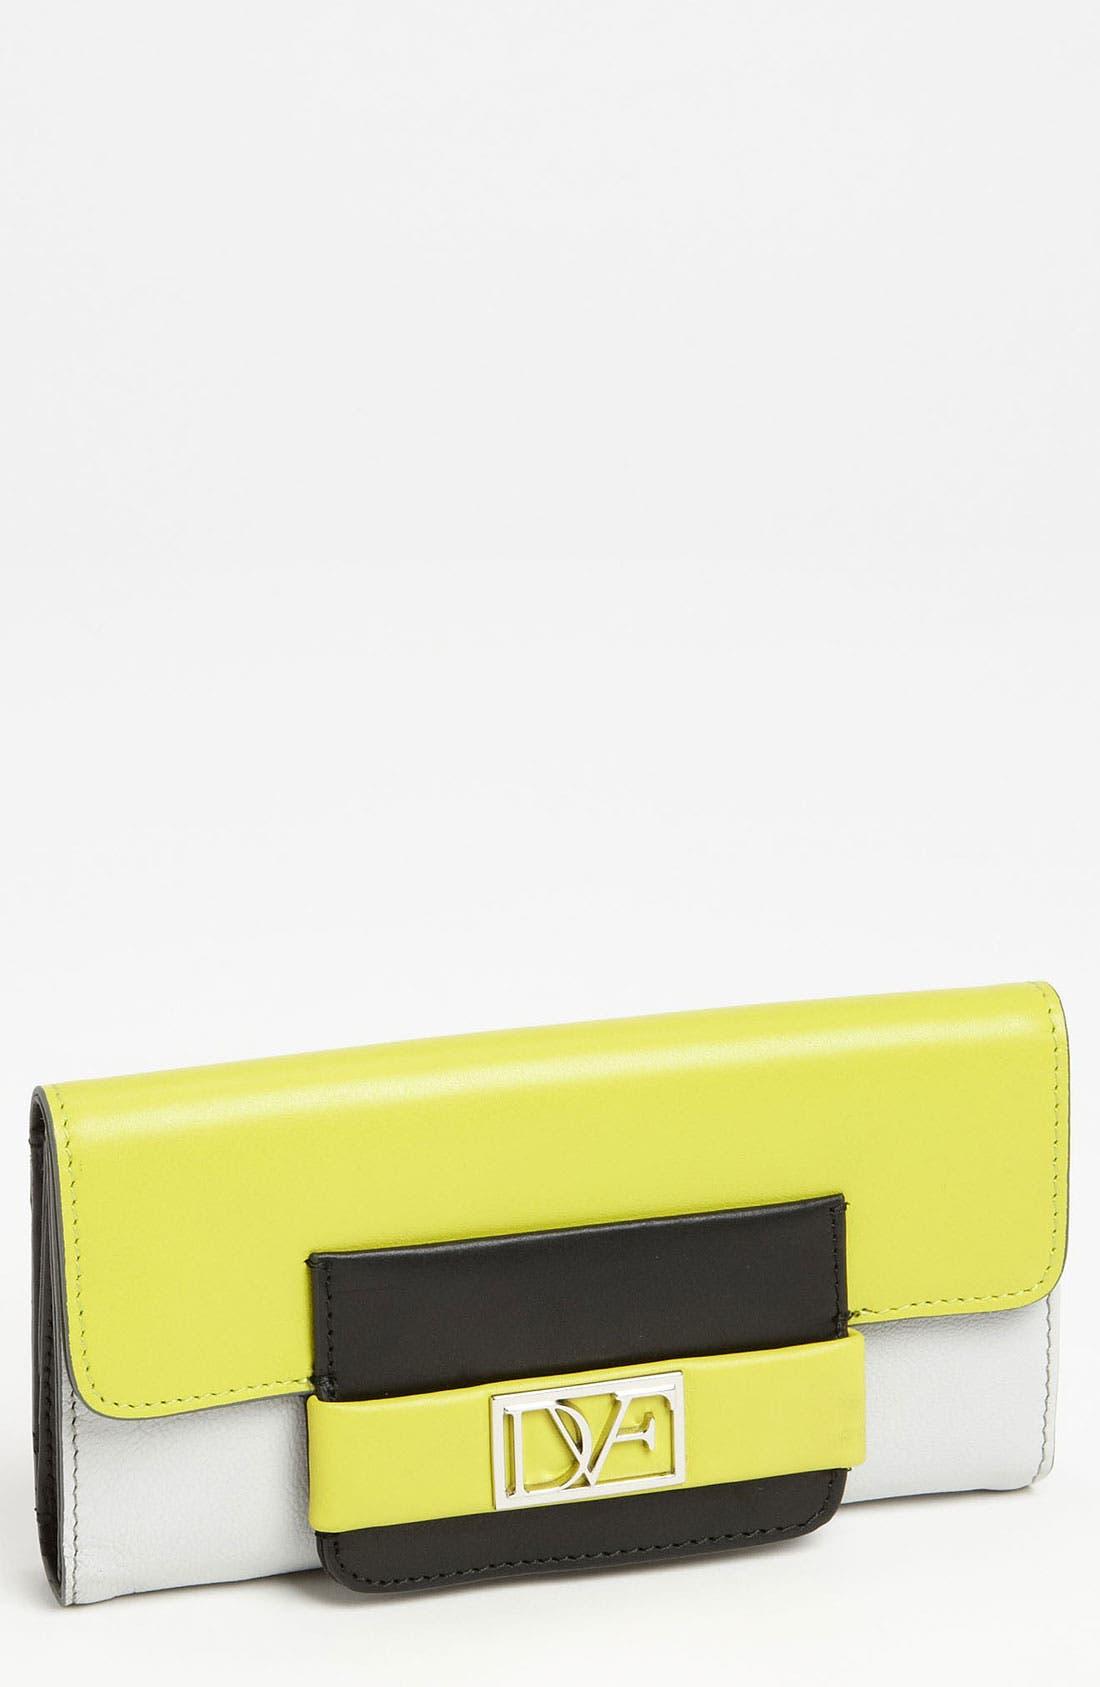 Alternate Image 1 Selected - Diane von Furstenberg 'Metro' Wallet